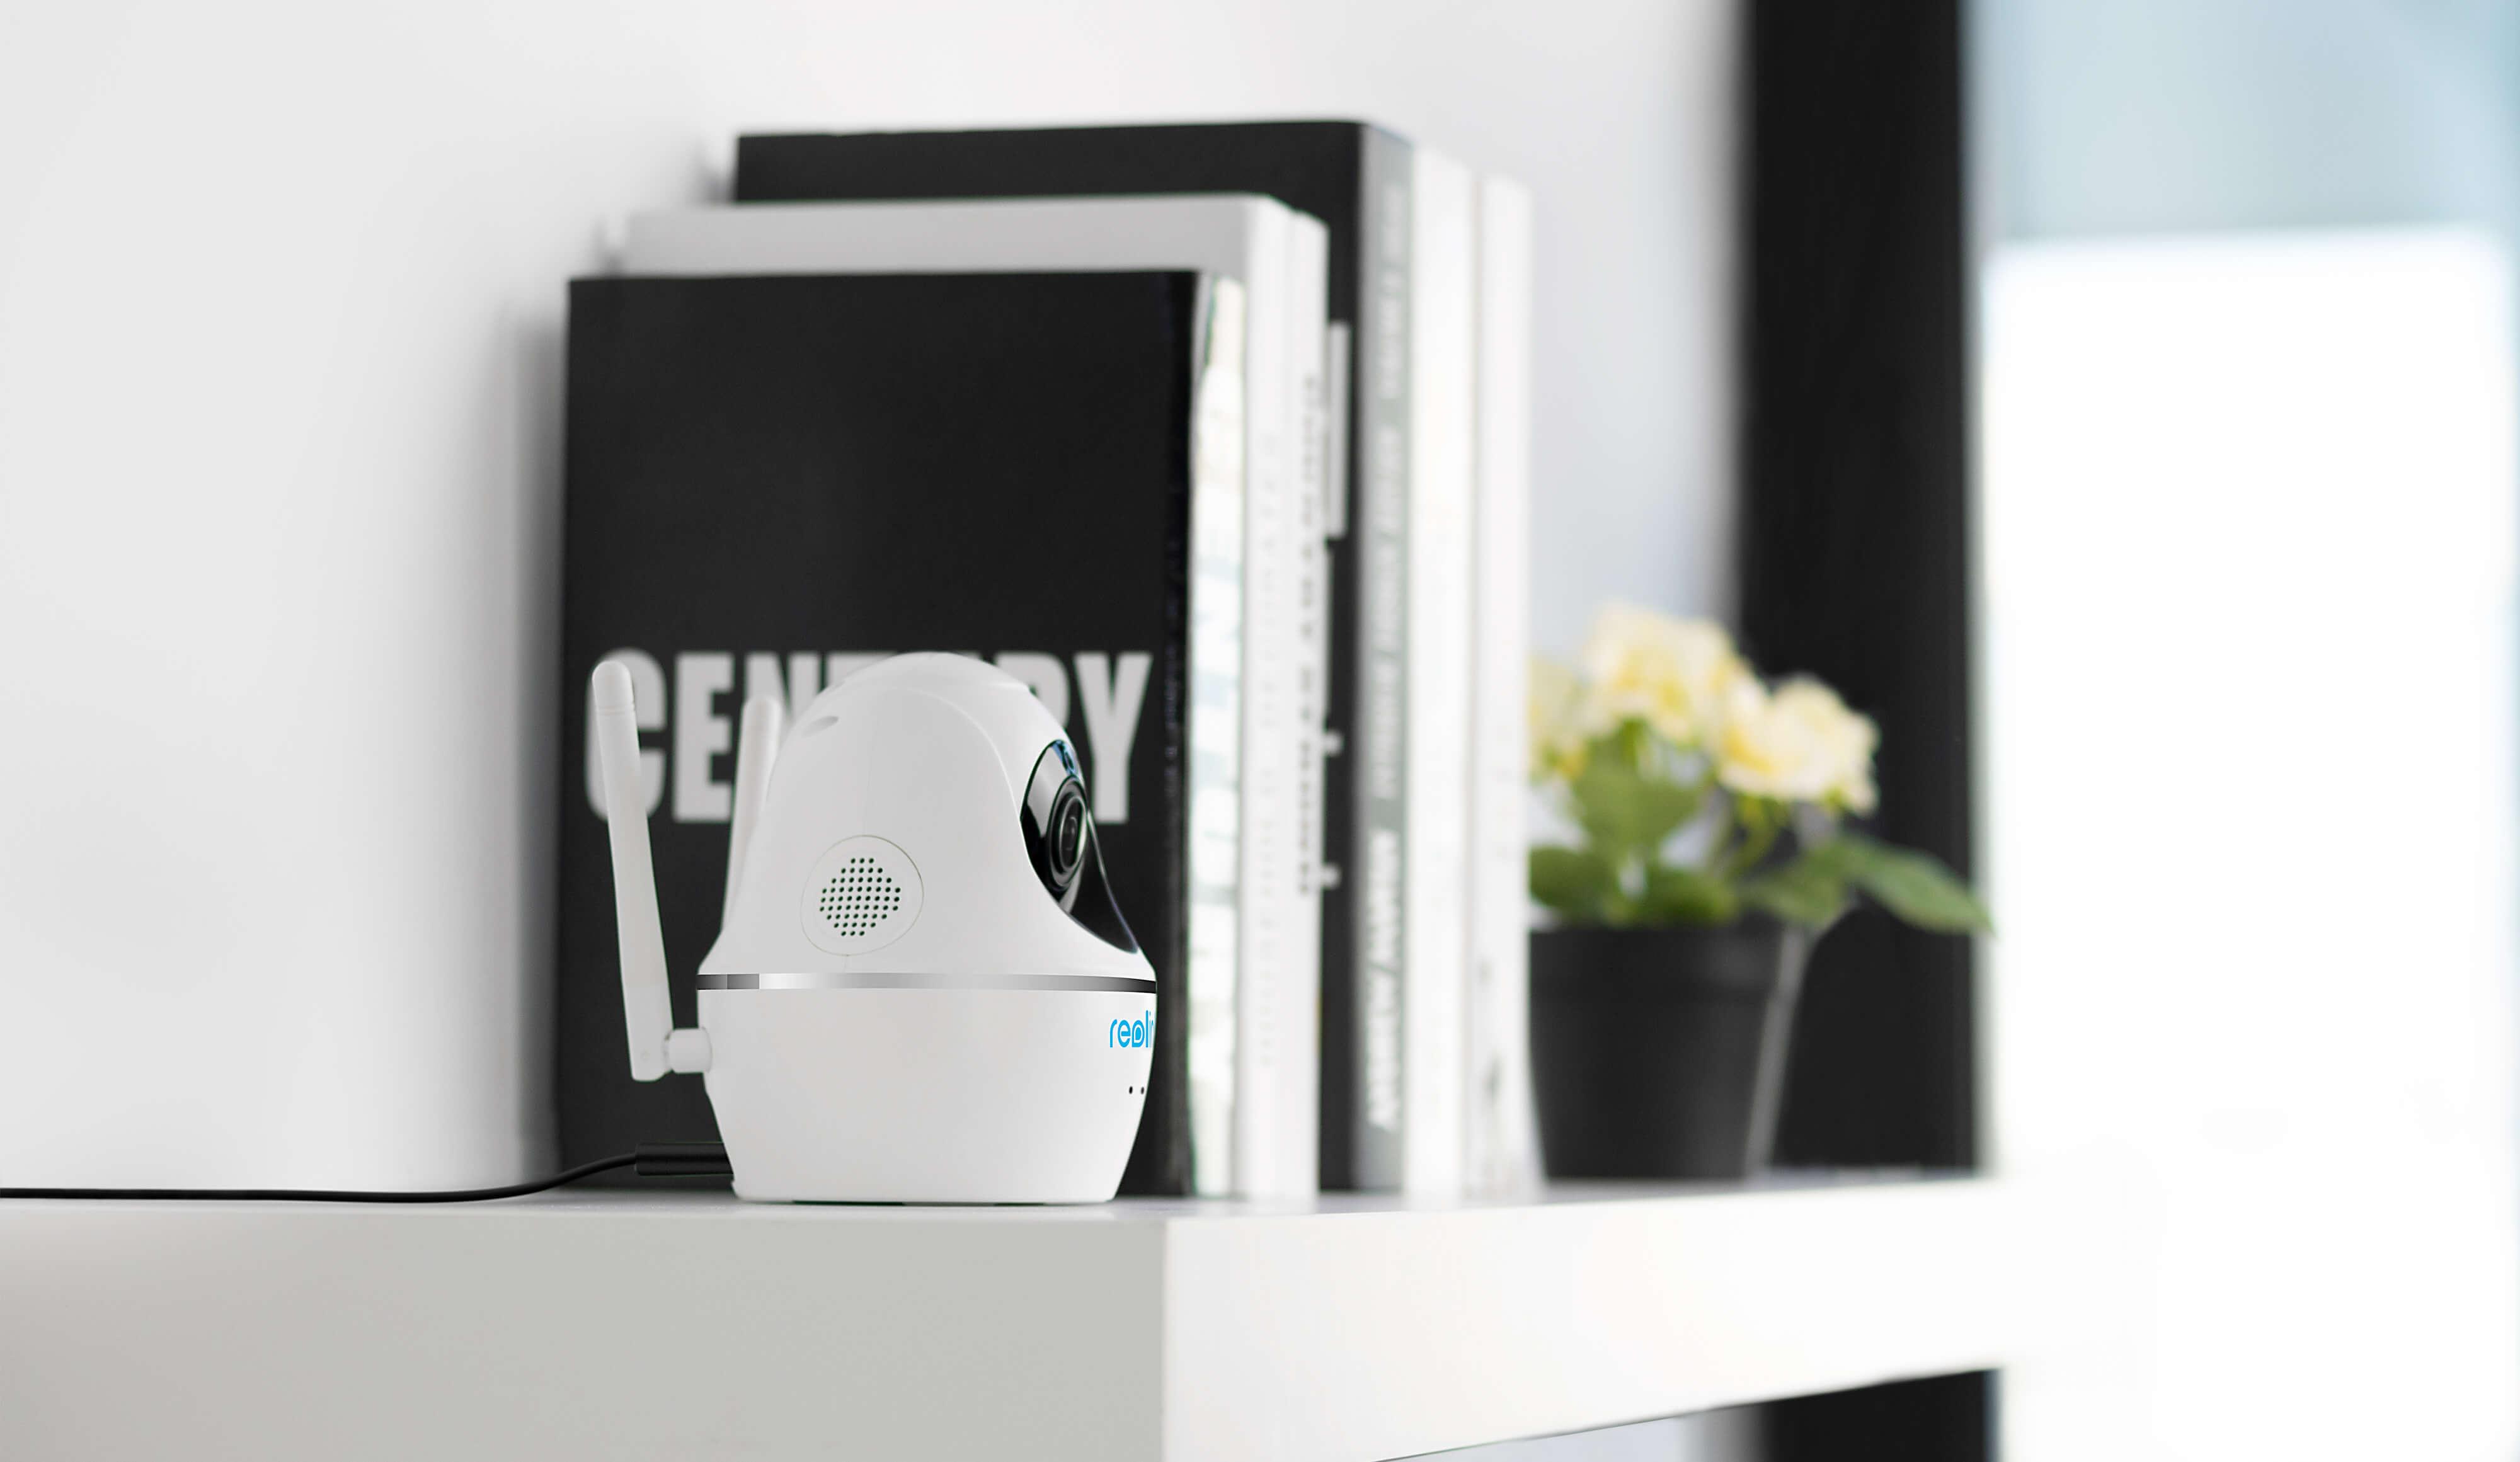 Reolink C2 Pro Test – Innenräume unter Kontrolle? 4 techboys.de • smarte News, auf den Punkt! Reolink C2 Pro Test – Innenräume unter Kontrolle?